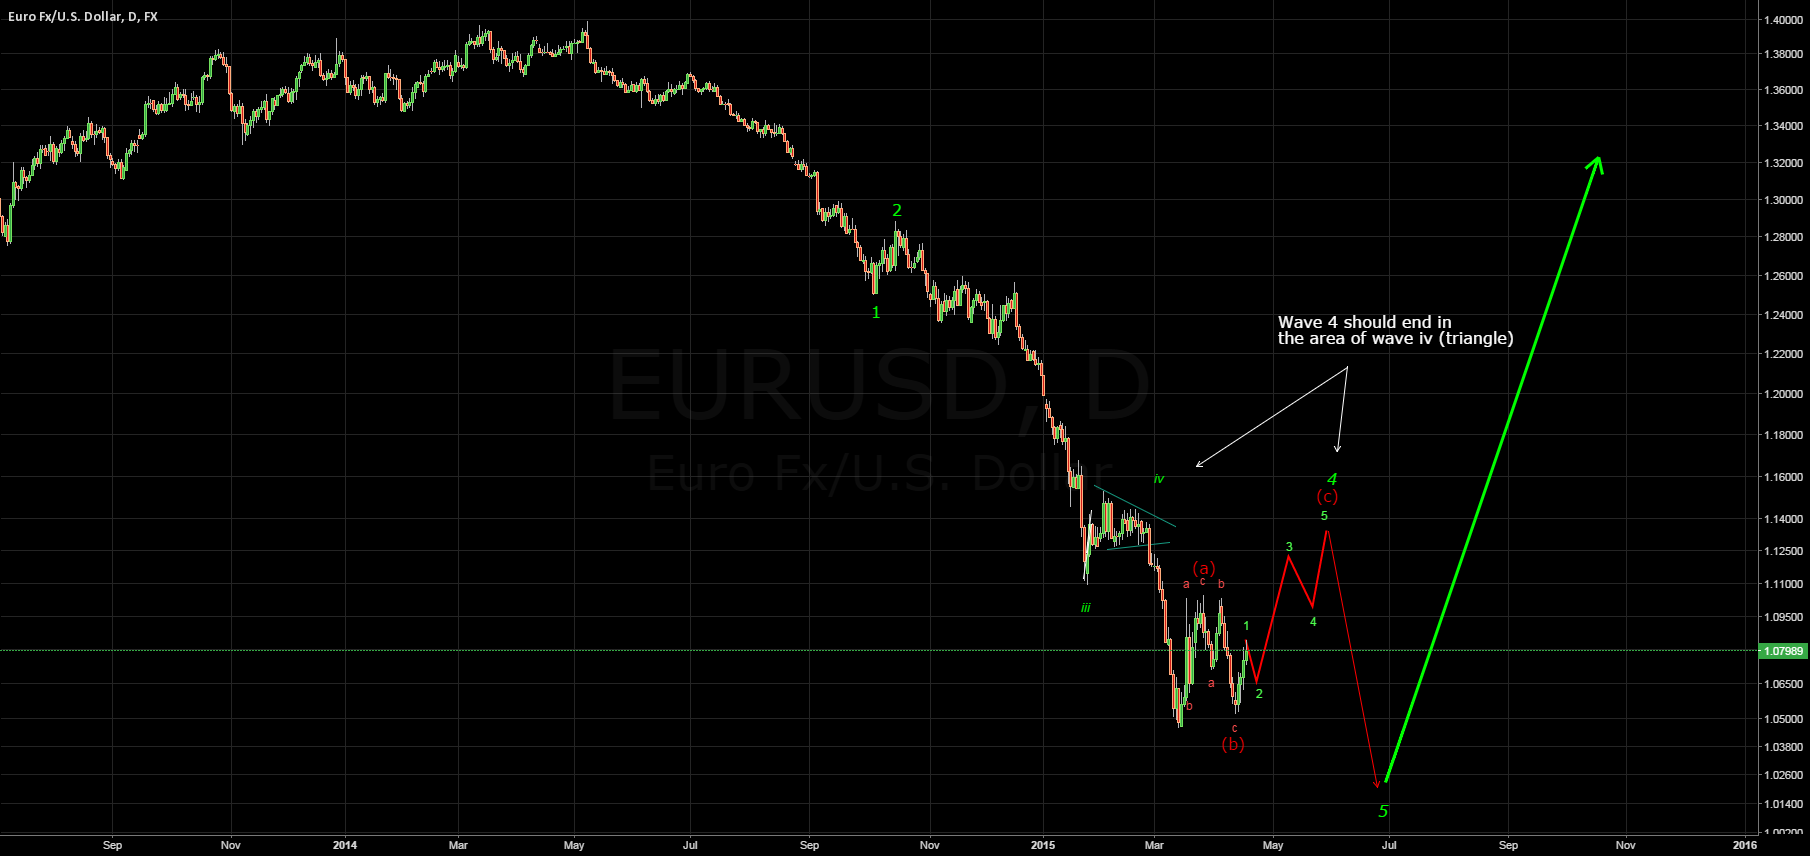 Week6: EURUSD will rise